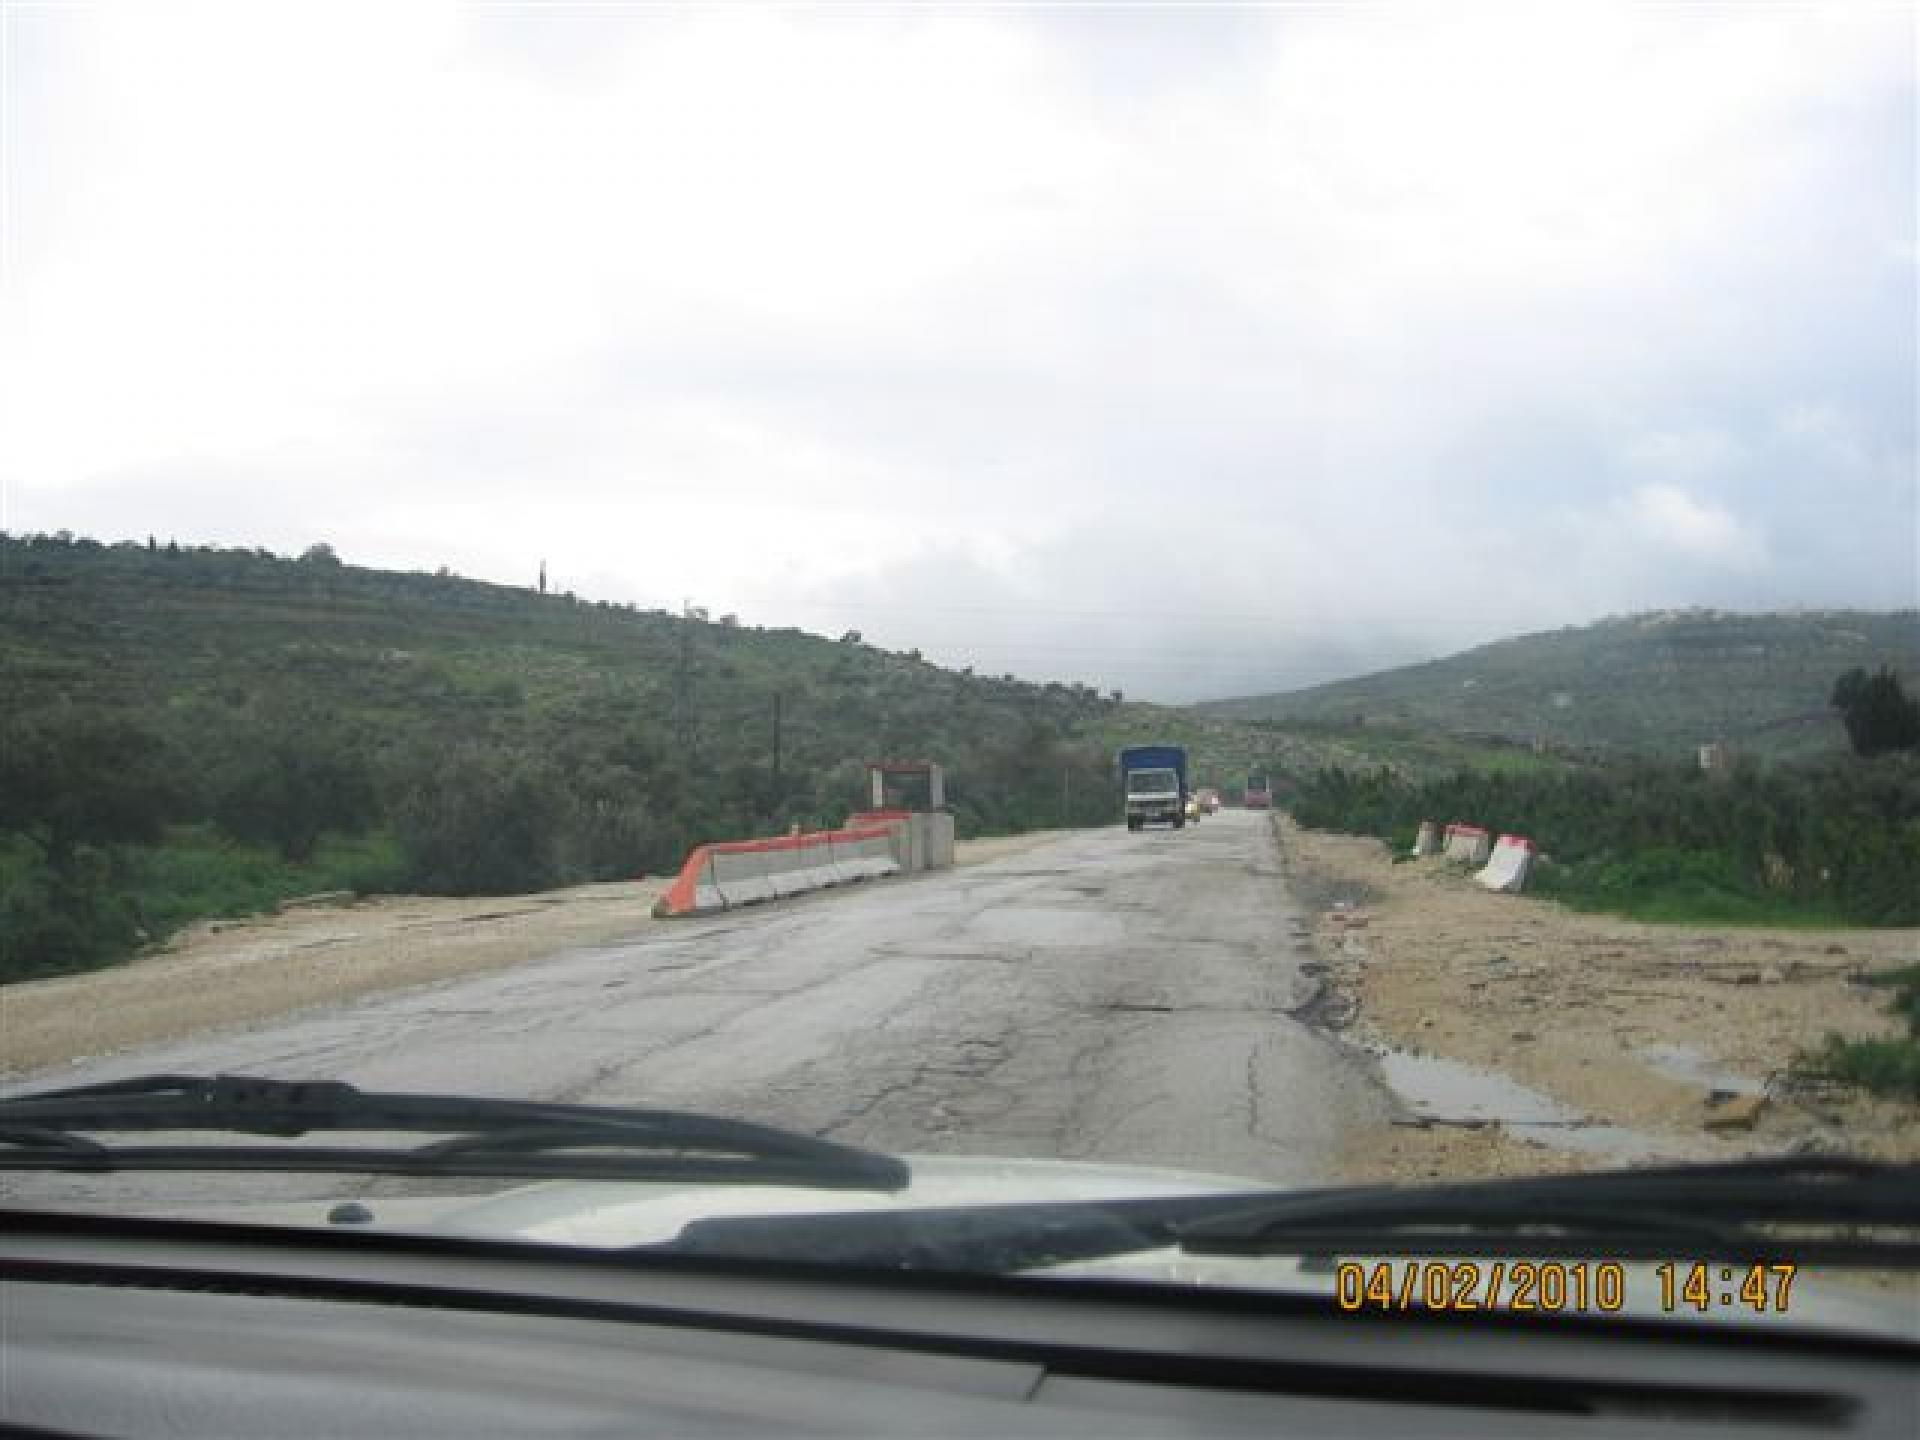 Deir Sharaf/Haviot checkpoint 04.02.10